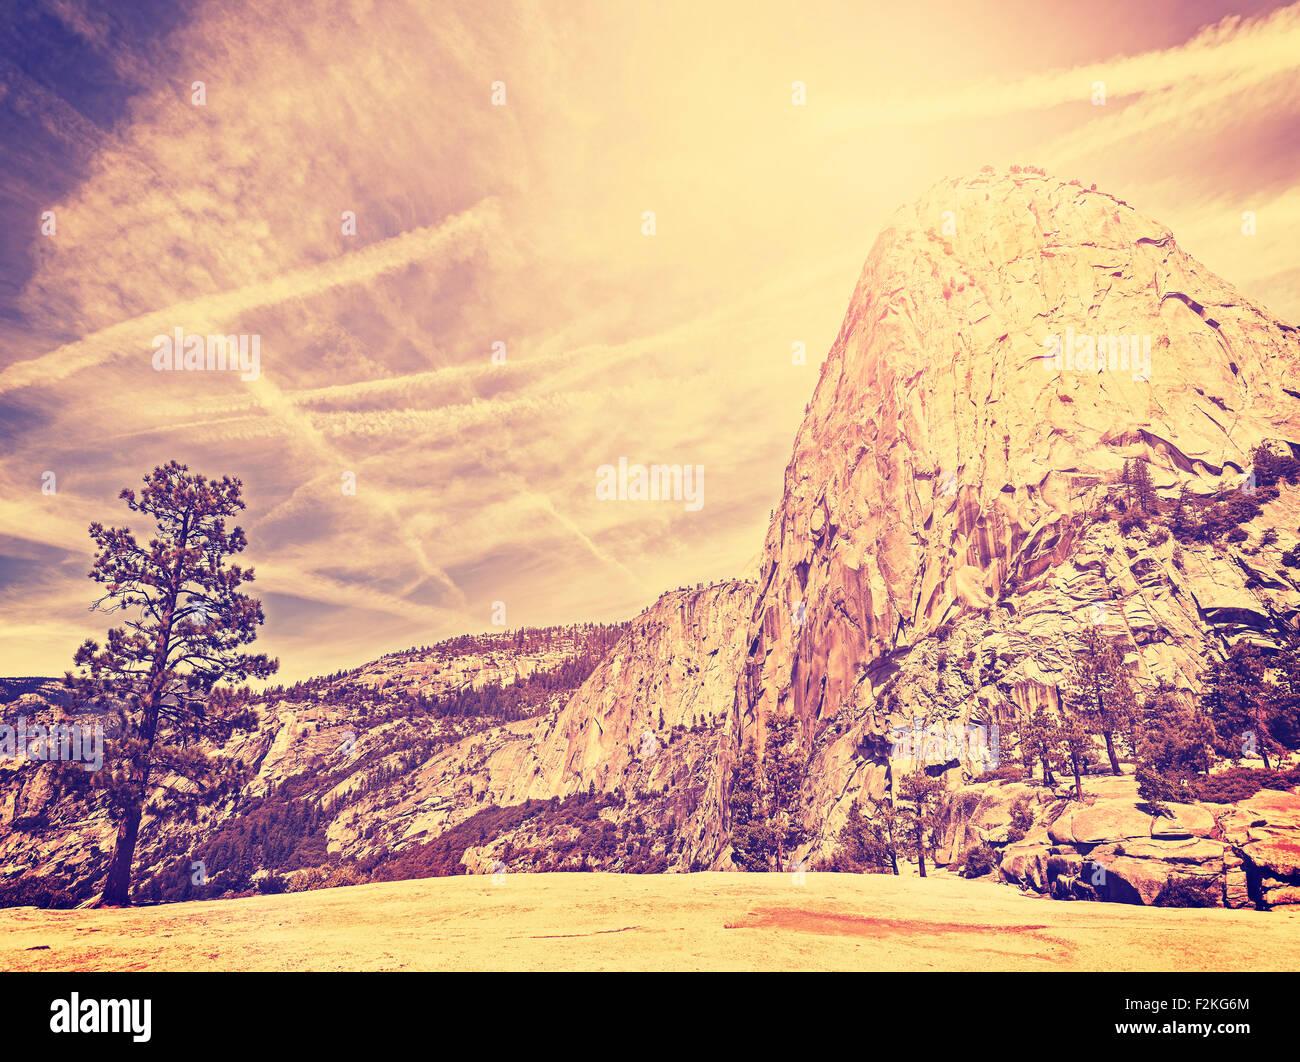 Nature montagne stylisée Vintage background, Yosemite National Park, USA. Banque D'Images